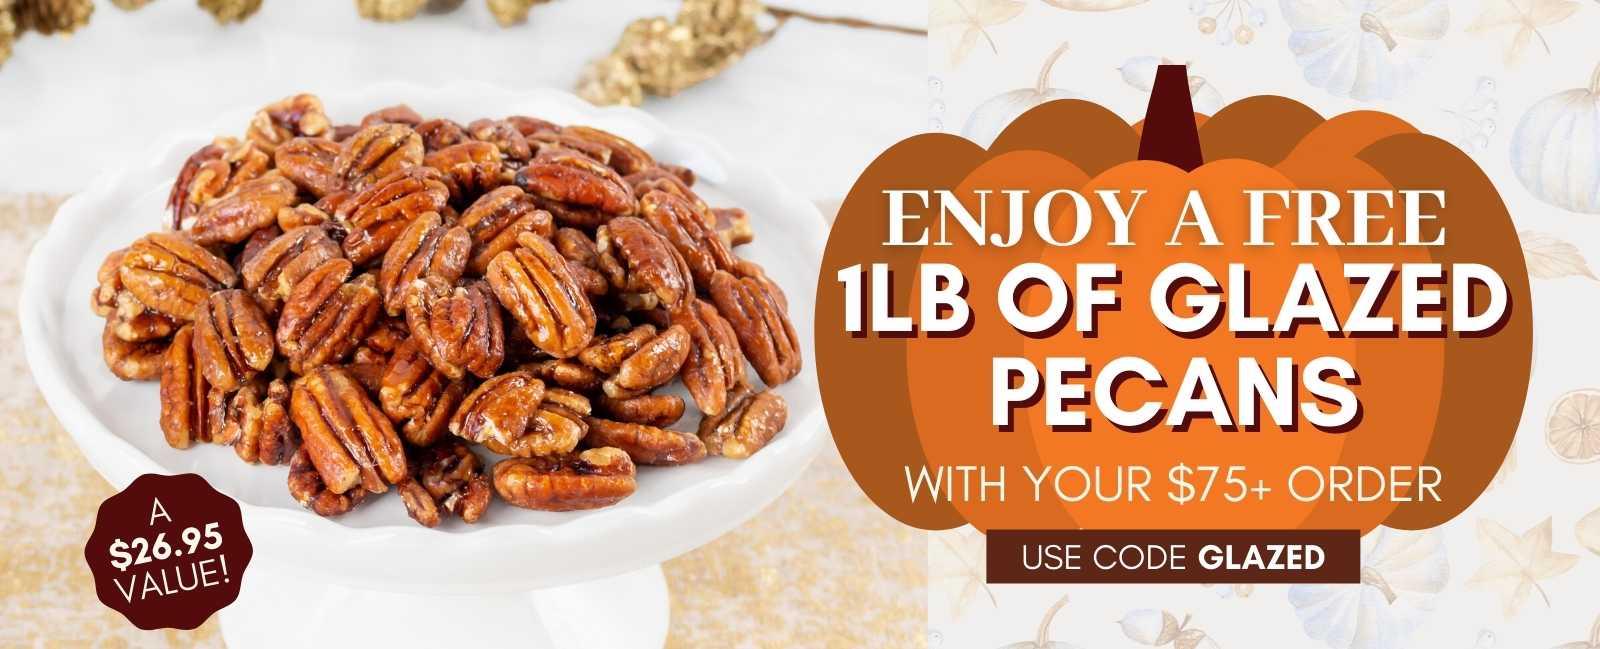 Free 1LB Glazed Pecans